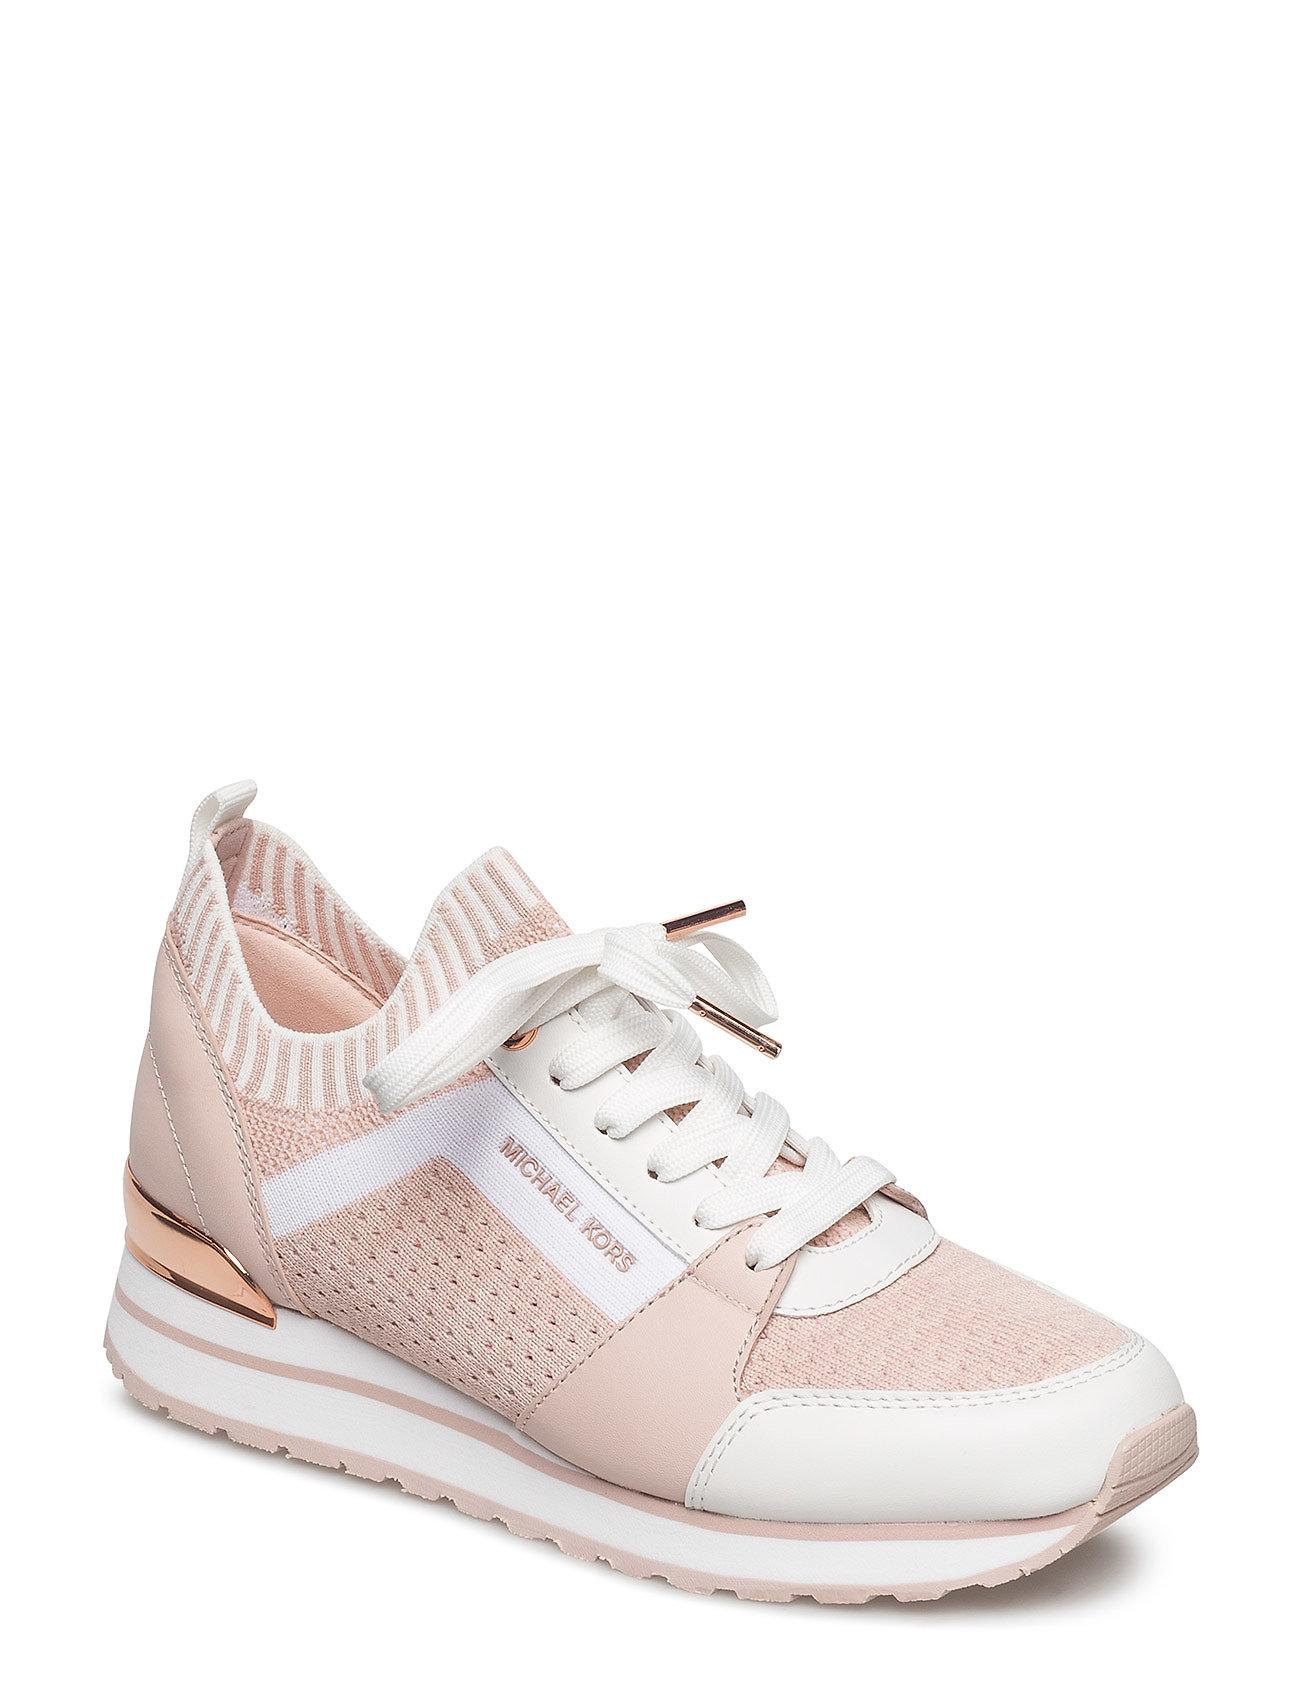 af76721edb5 Michael Kors Shoes Billie Knit Trainers michael kors shoes kopen in de  aanbieding